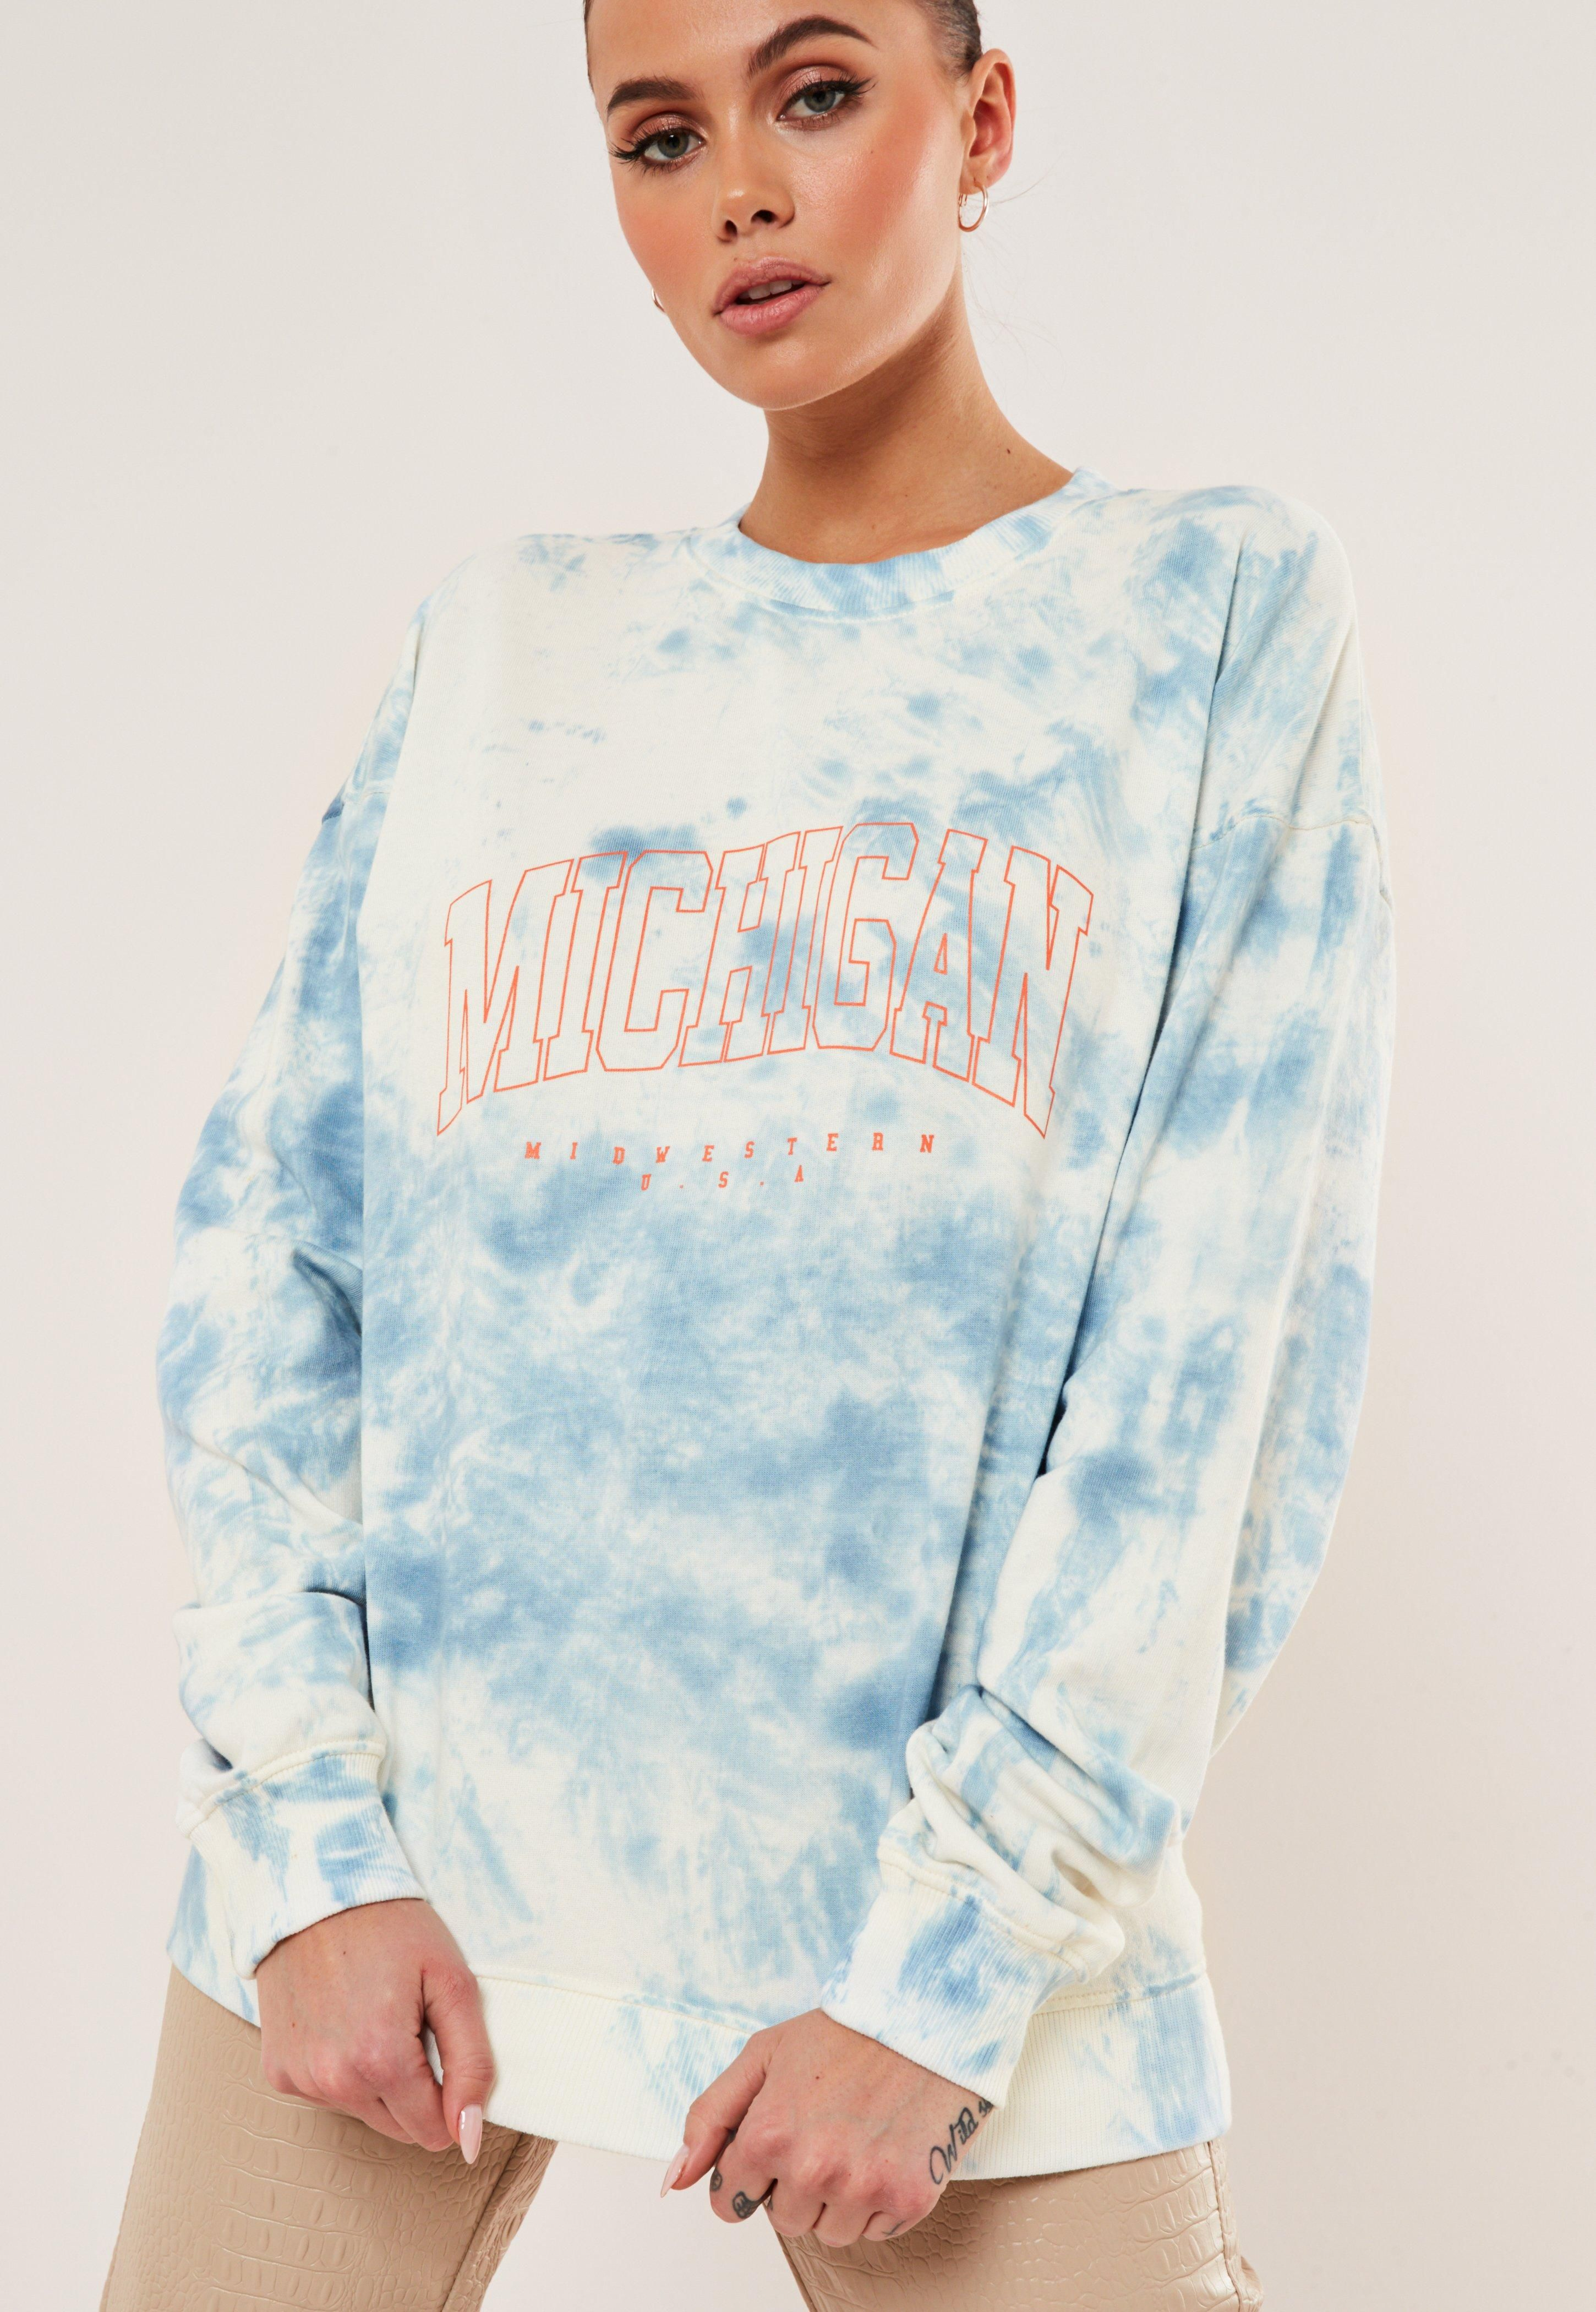 Blue Tie Dye Michigan Sweatshirt Sponsored Tie Spon Blue Dye Tie Dye Outfits Tye Dye Shirts Diy Tie Dye Shirts [ 4200 x 2900 Pixel ]